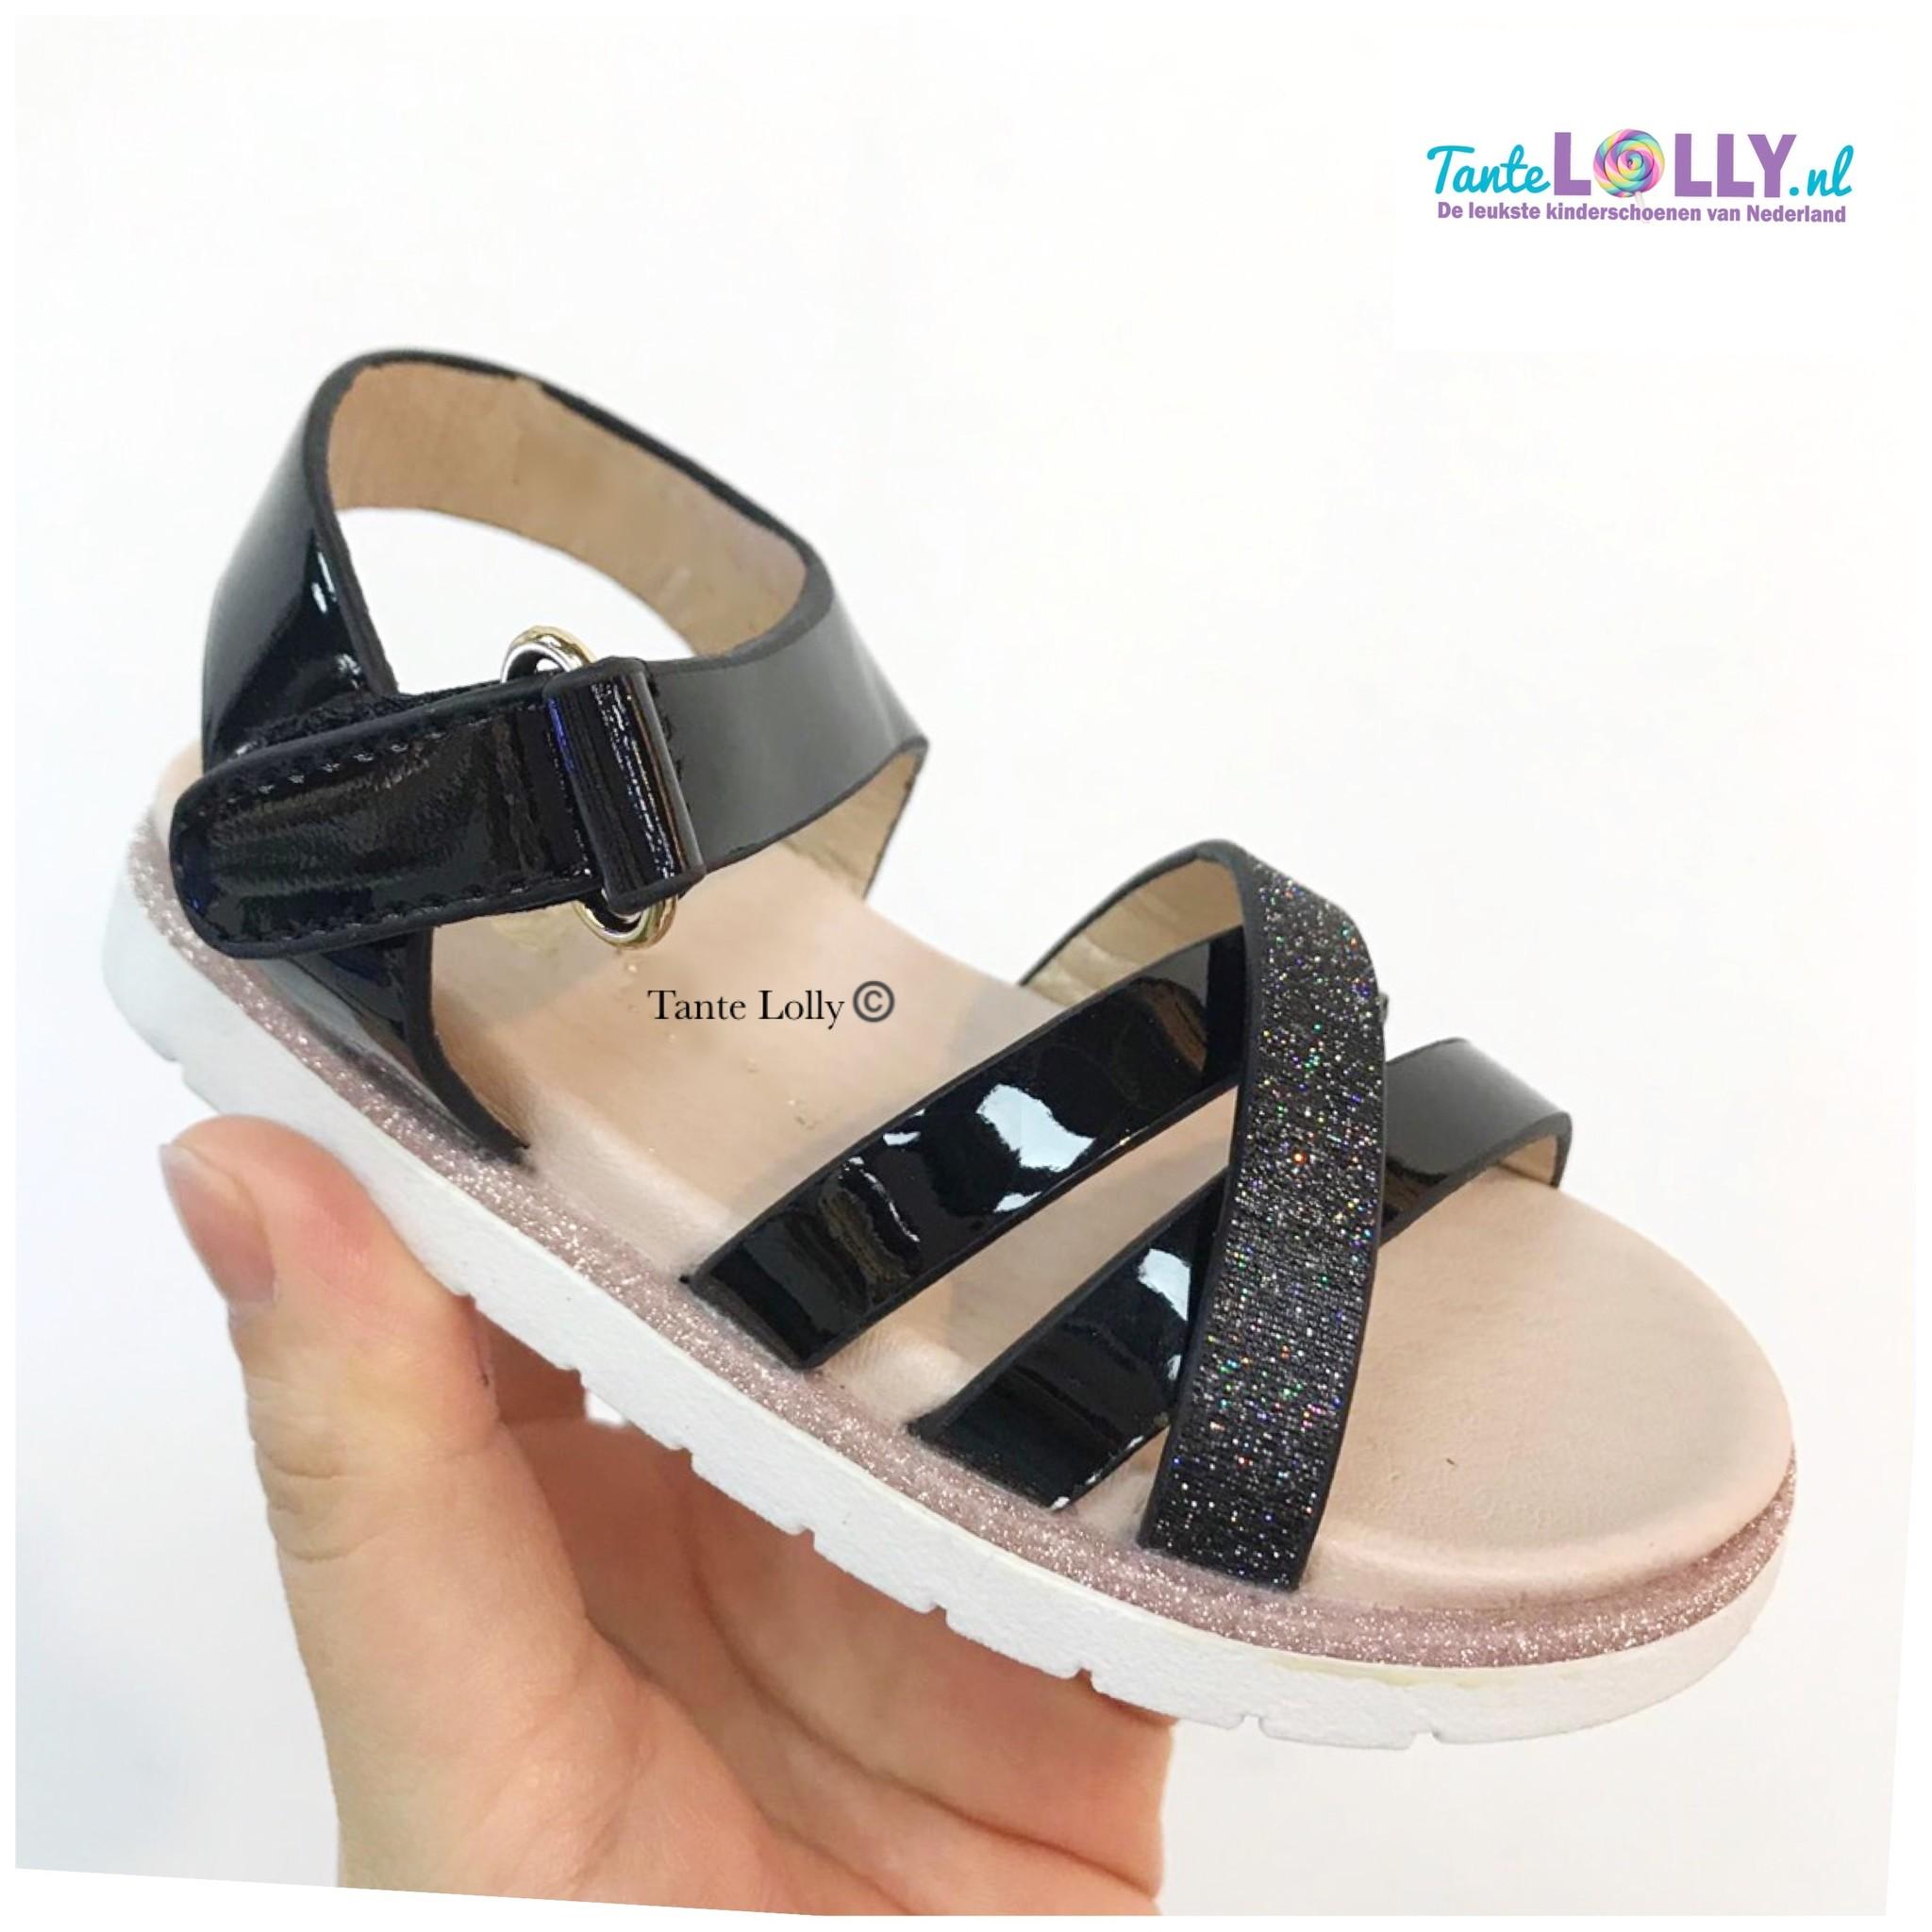 Kinderschoenen 19.Sandalen Fiona Zwart 19 36 Tante Lolly Kinderschoenen